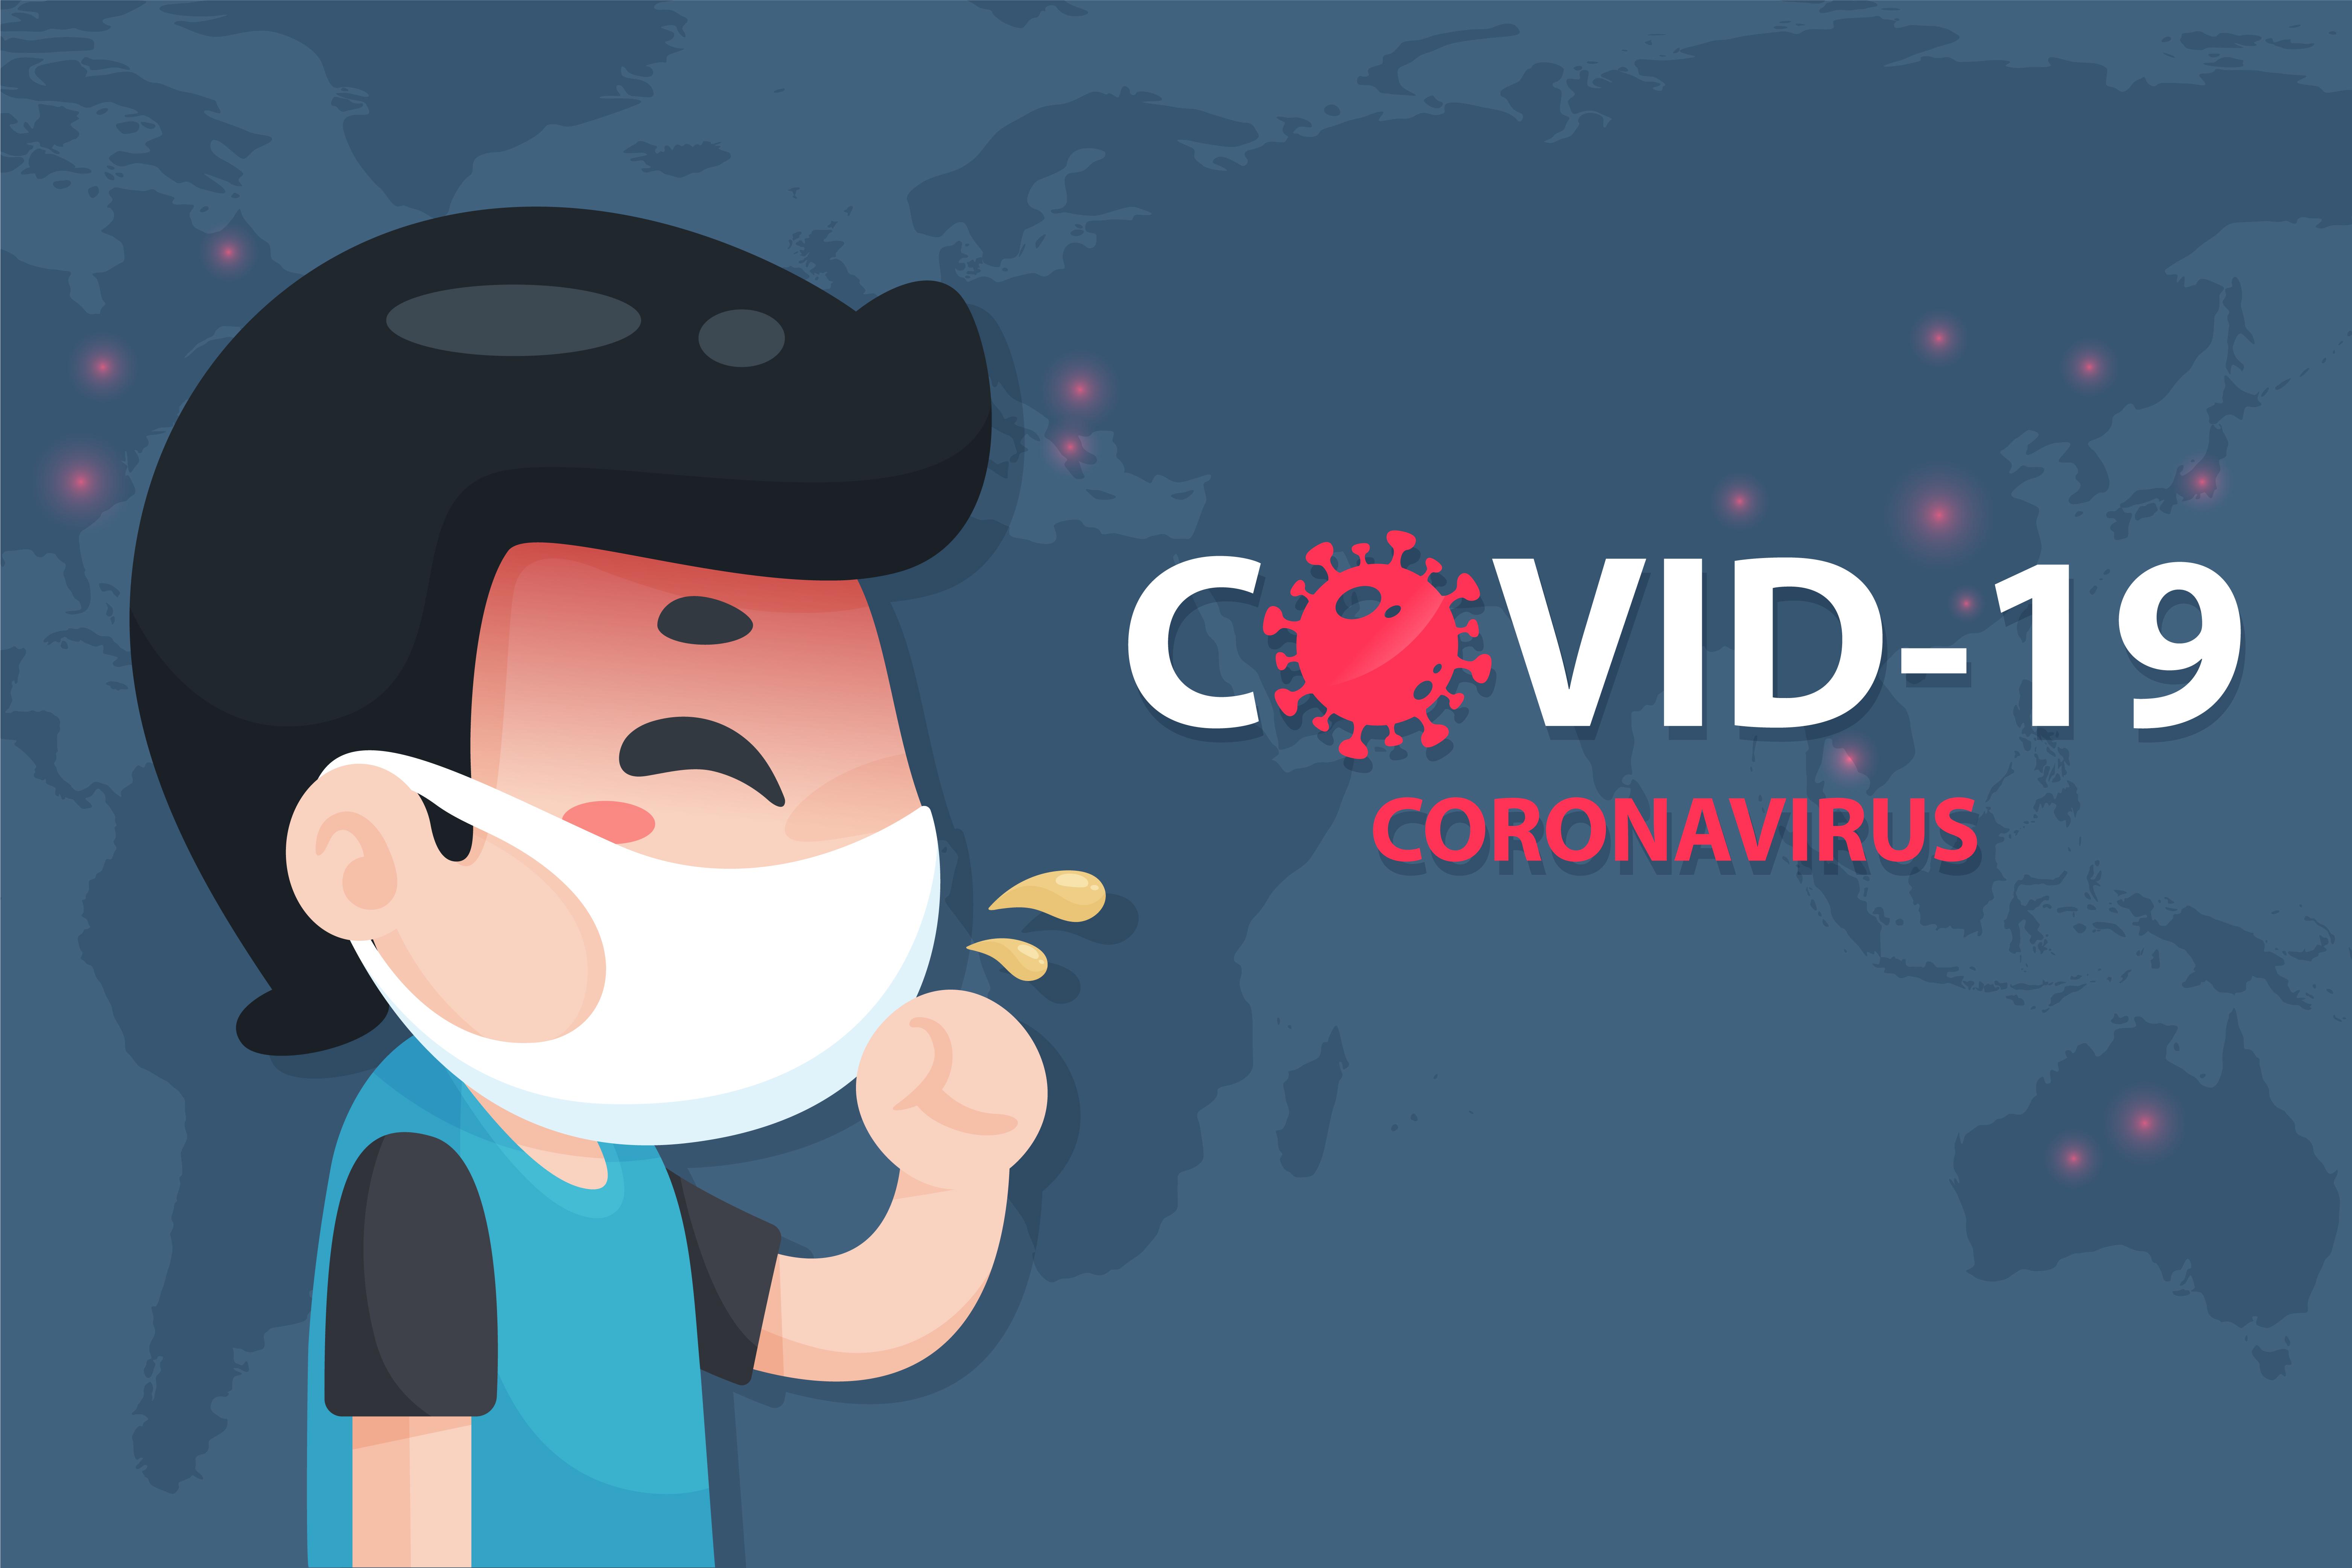 Cartoon Man With Coronavirus Symptoms Covid Poster Download Free Vectors Clipart Graphics Vector Art